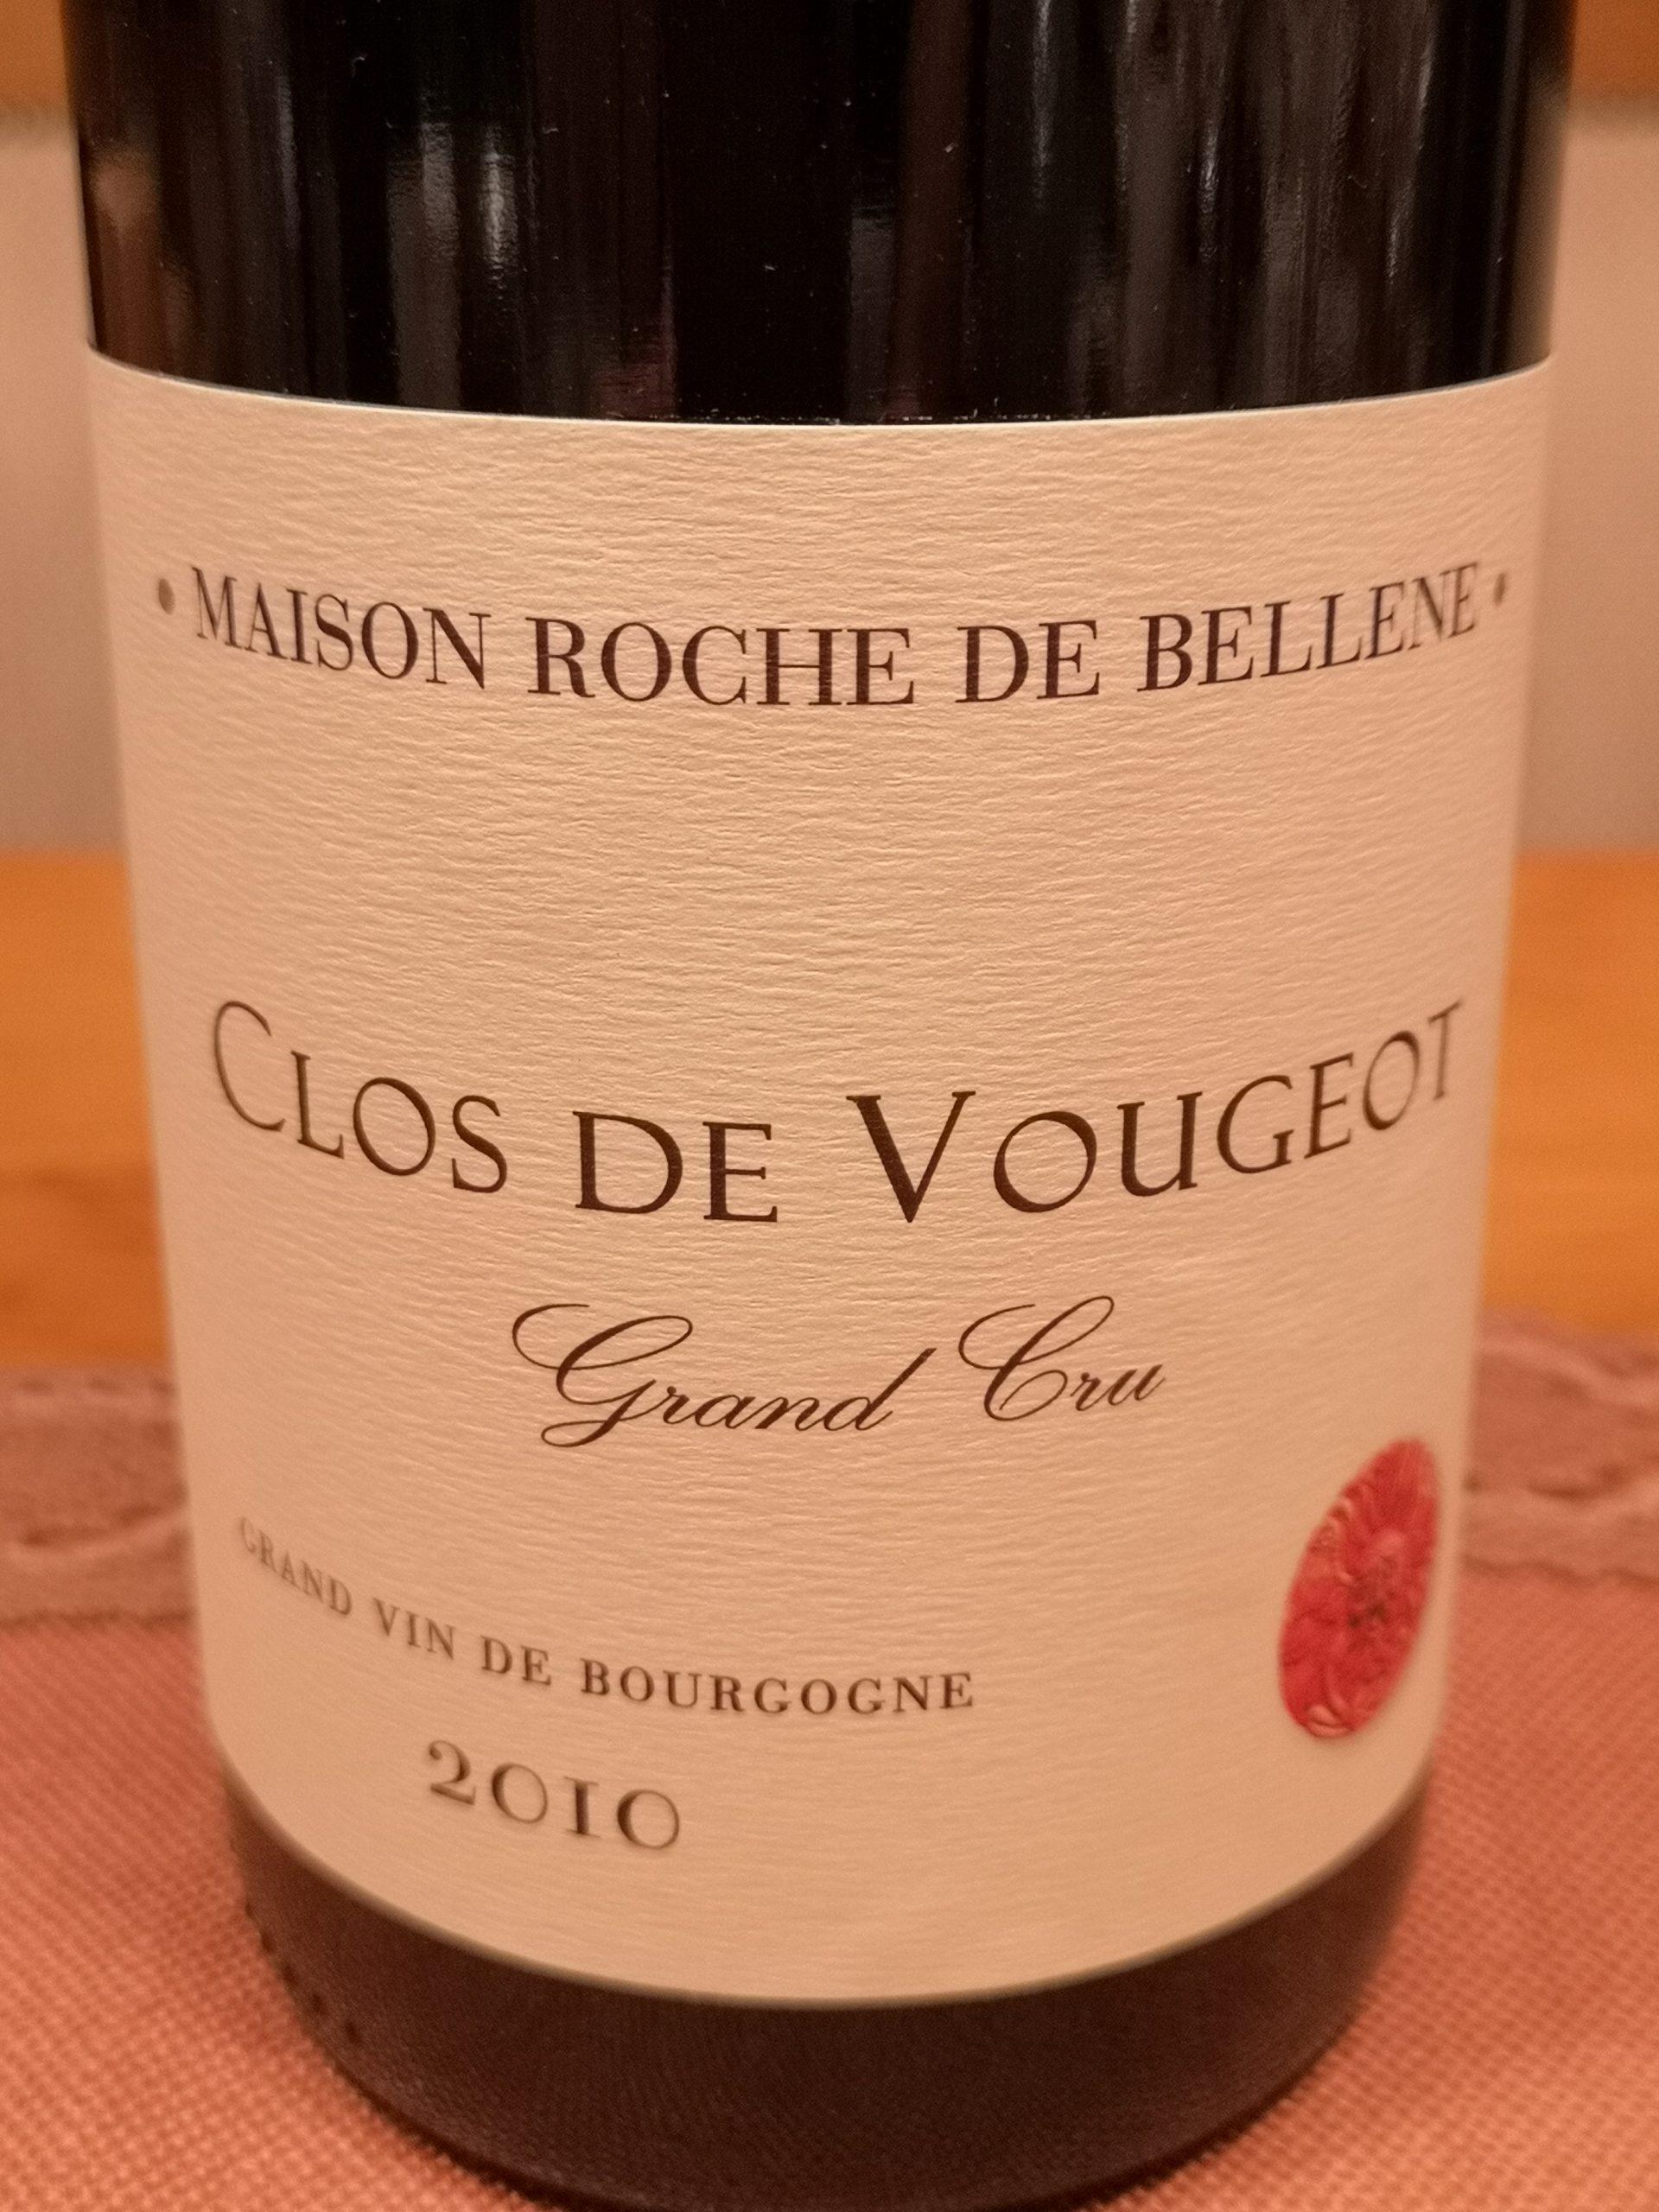 2010 Clos de Vougeot Grand Cru | Potel/Roche de Bellene